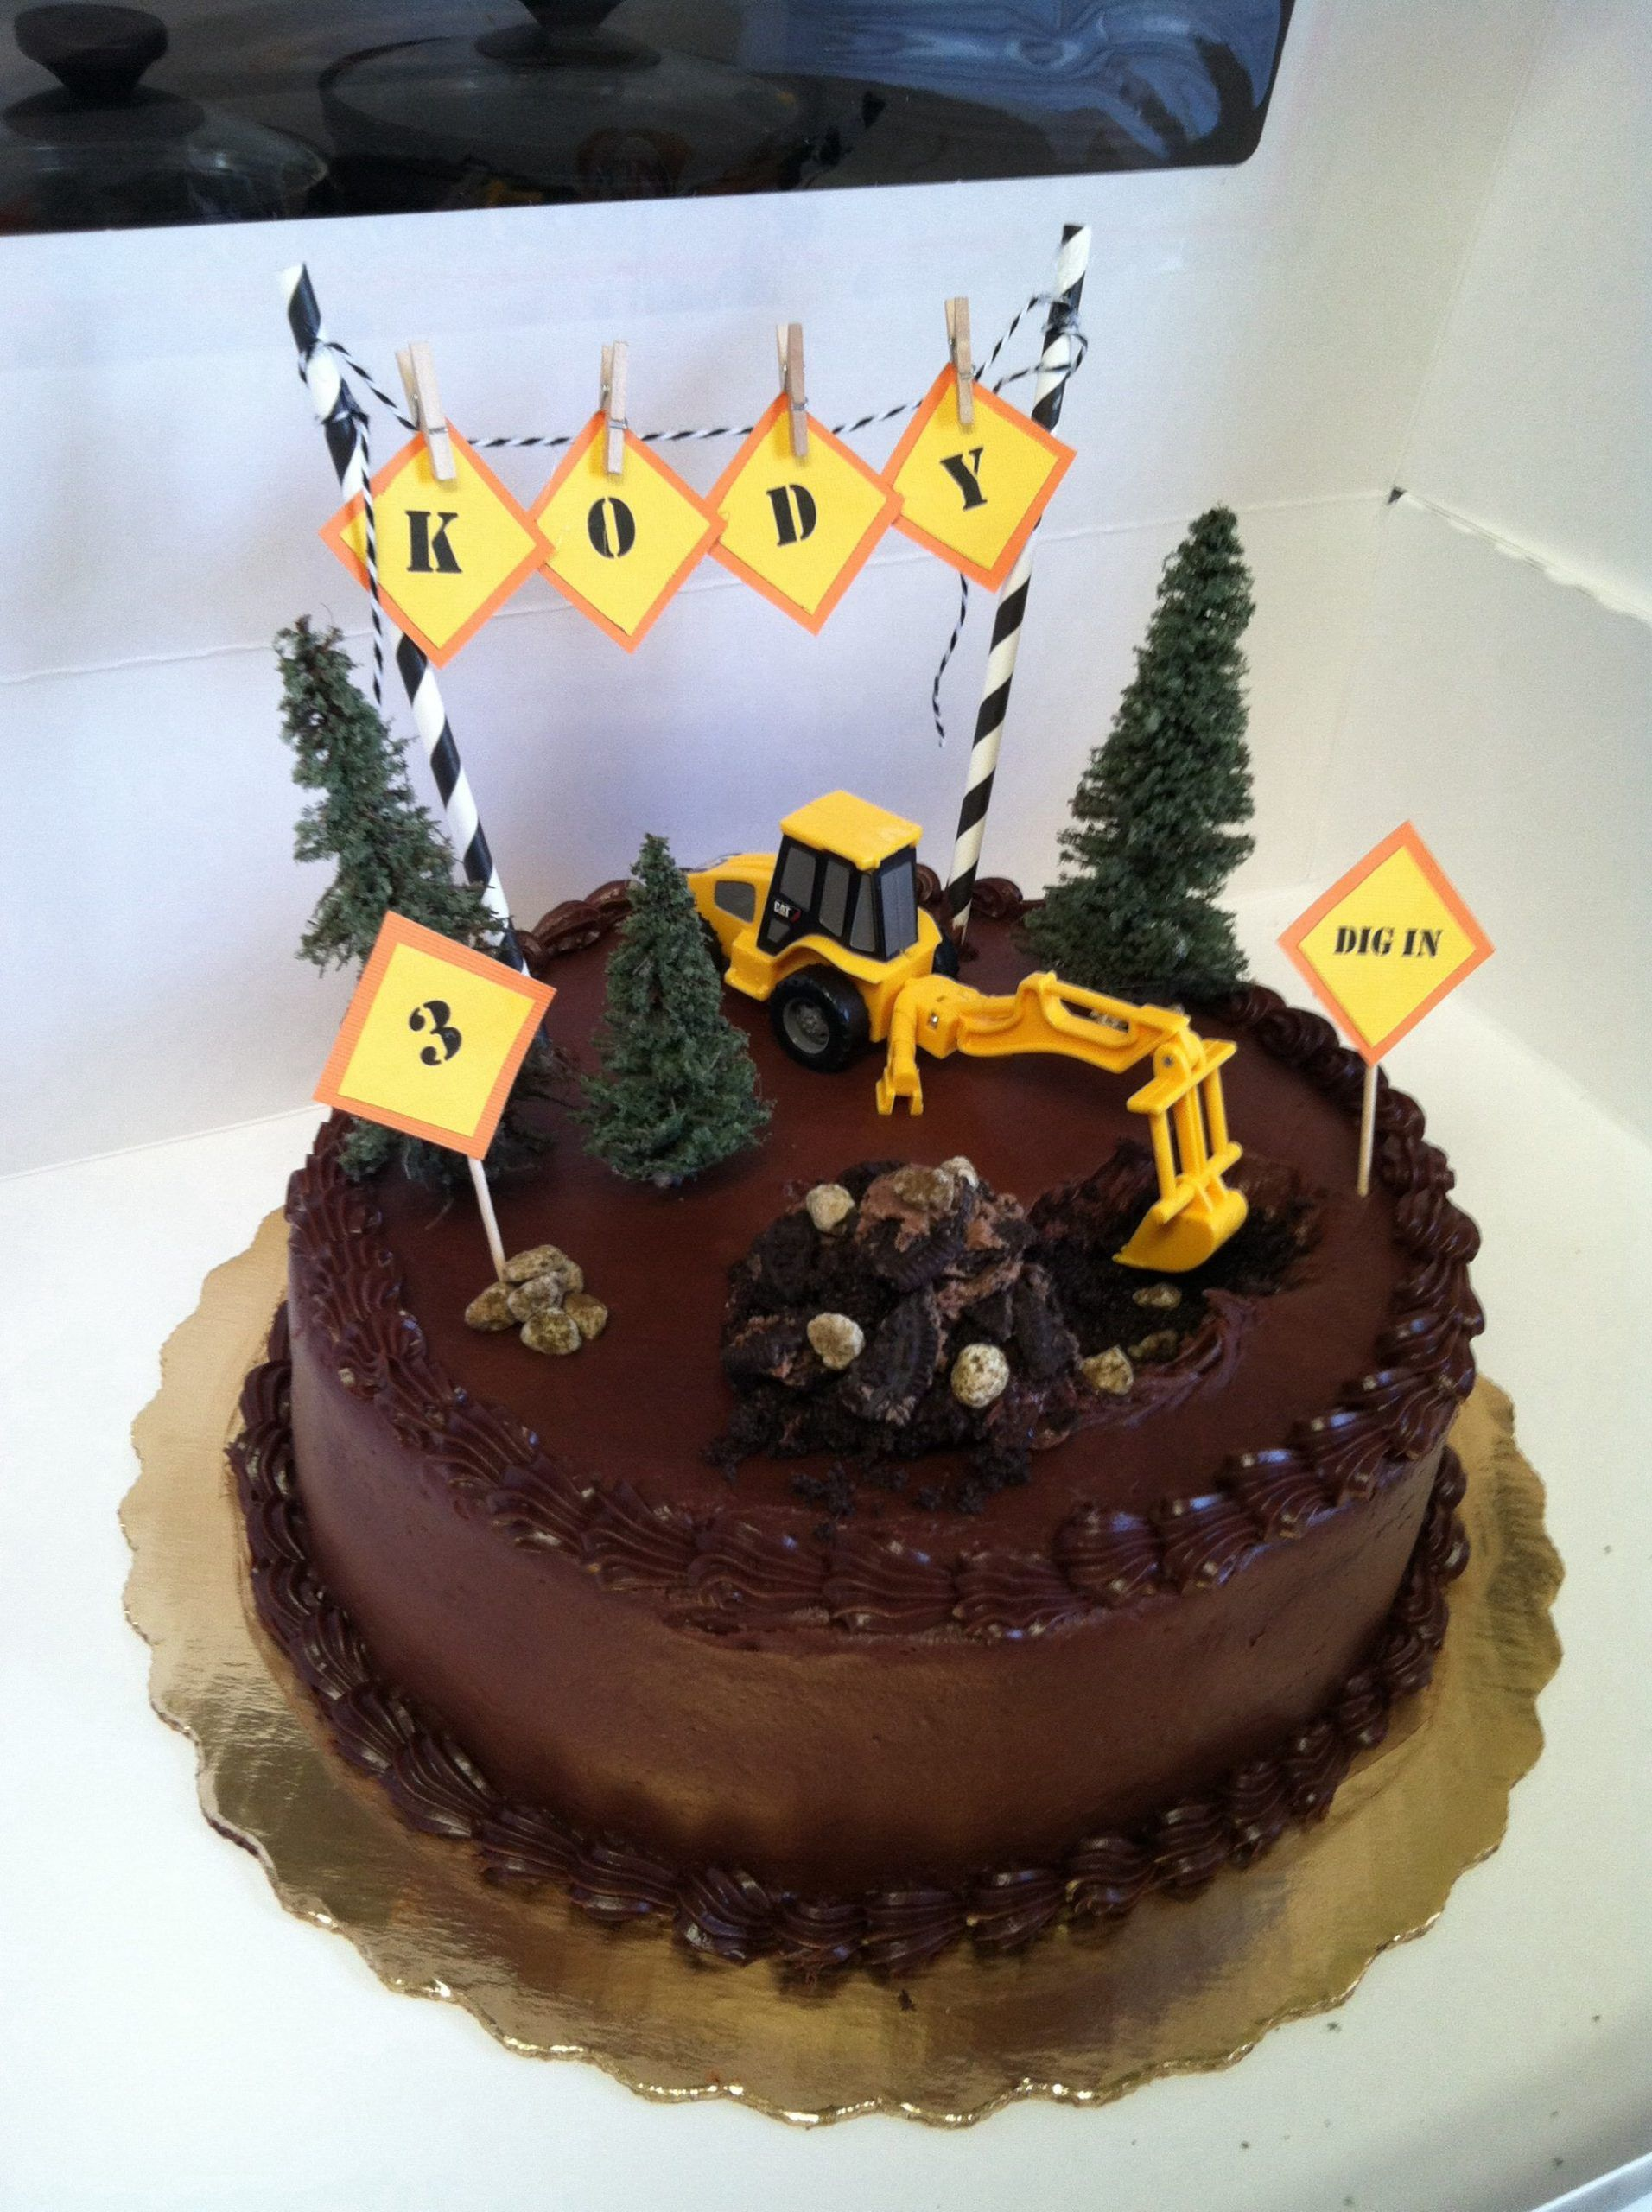 Kody's construction birthday cake, 2020 Doğum günü